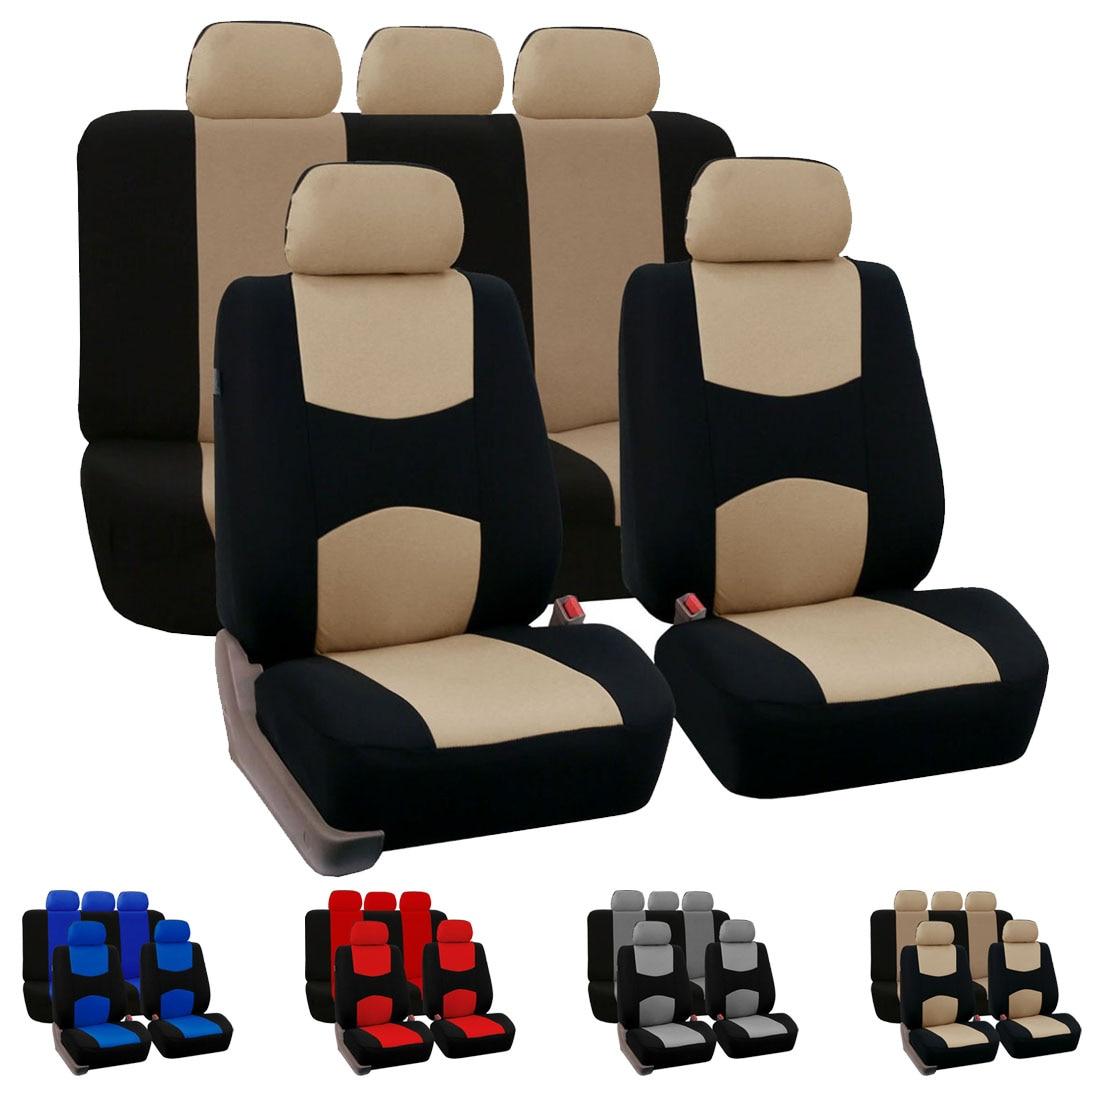 Dewtreetali Full Set Car Seat Covers Universal Fit Car Seat Protectors Auto font b Interior b